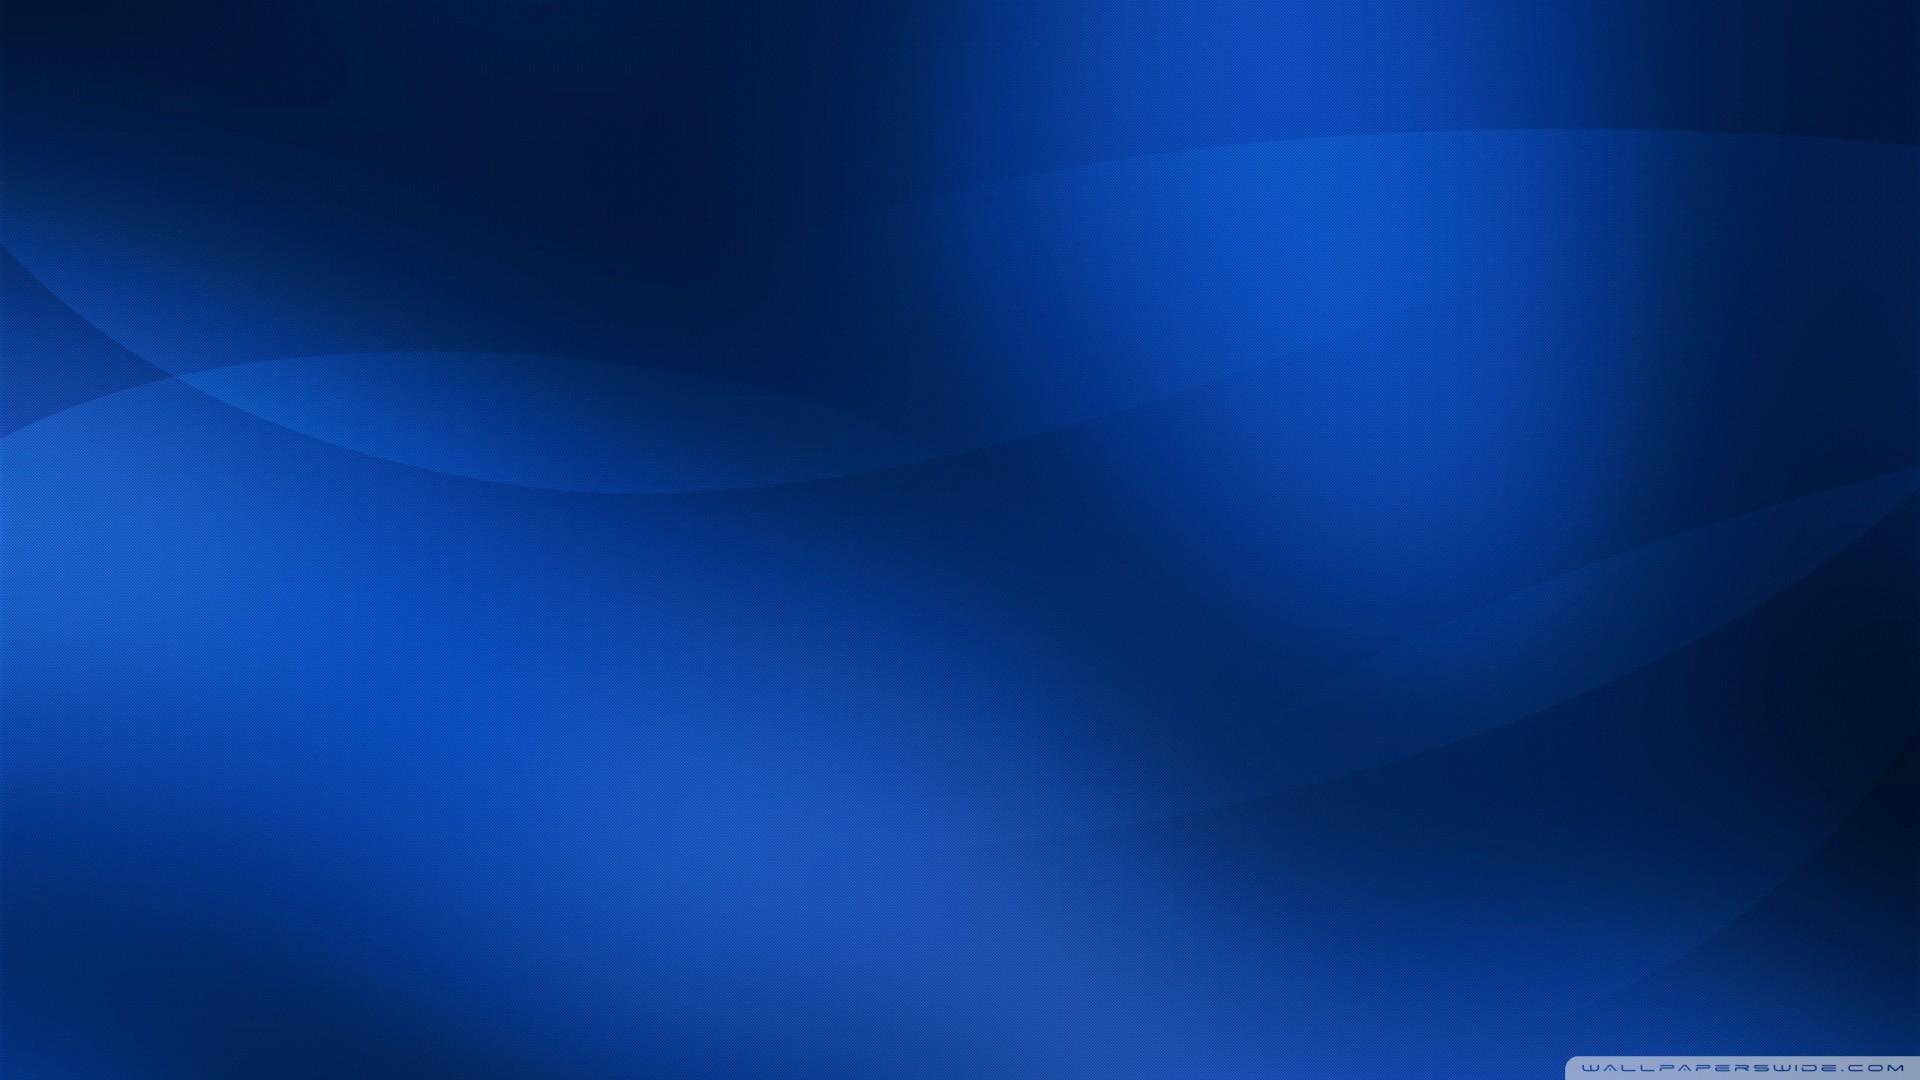 Blue Wallpaper 77 Images